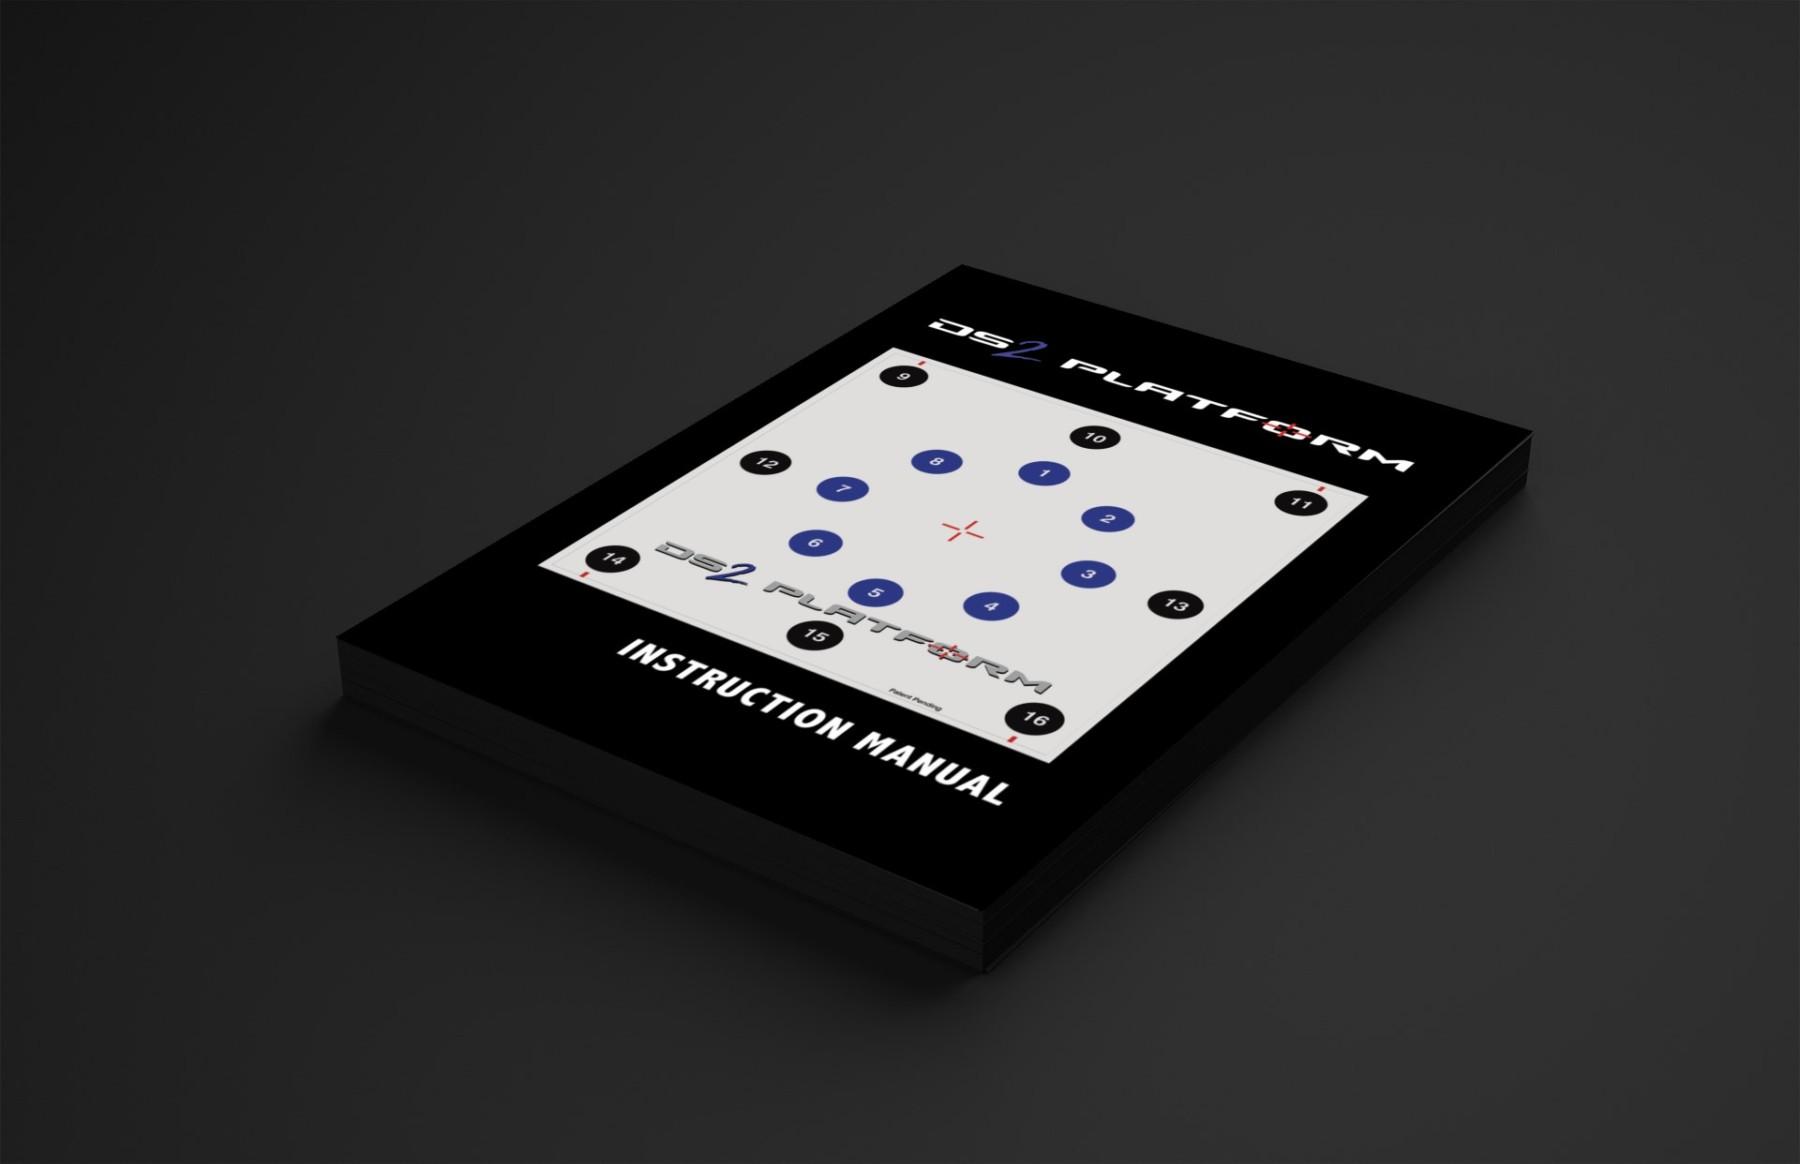 DS2 Instruction Manual Design